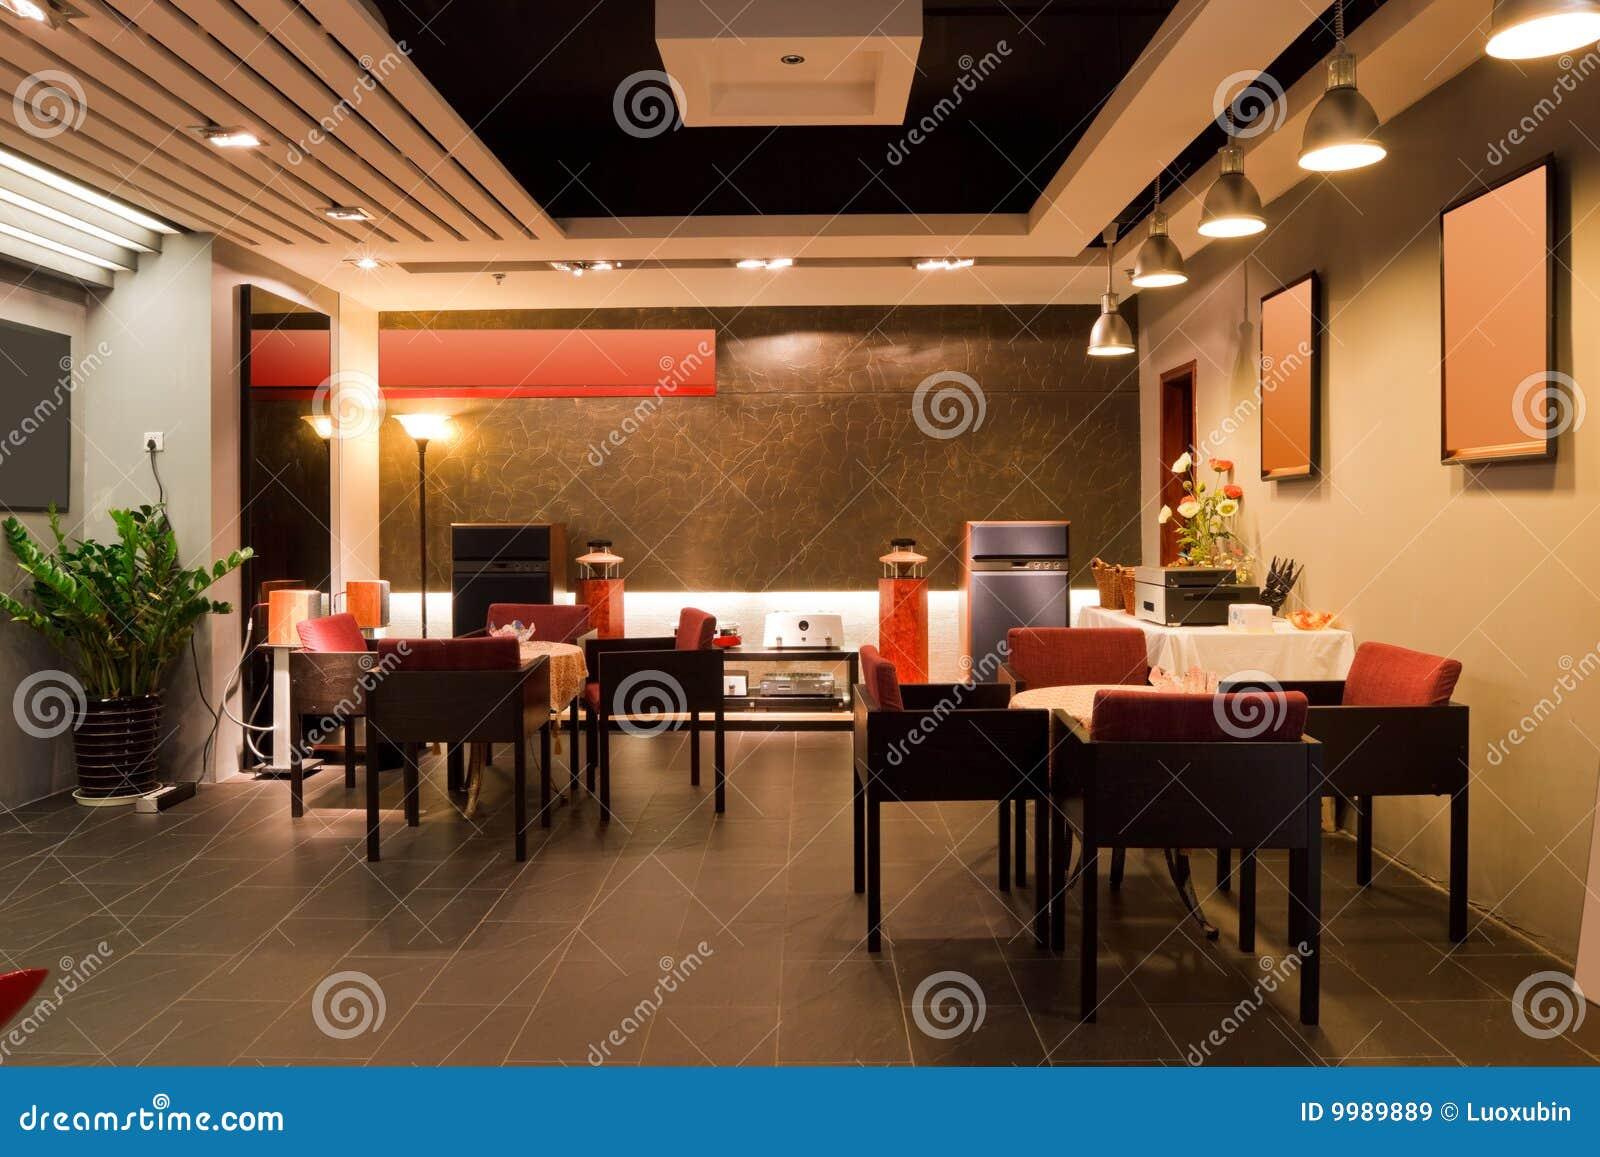 Modern bar or restaurant interior